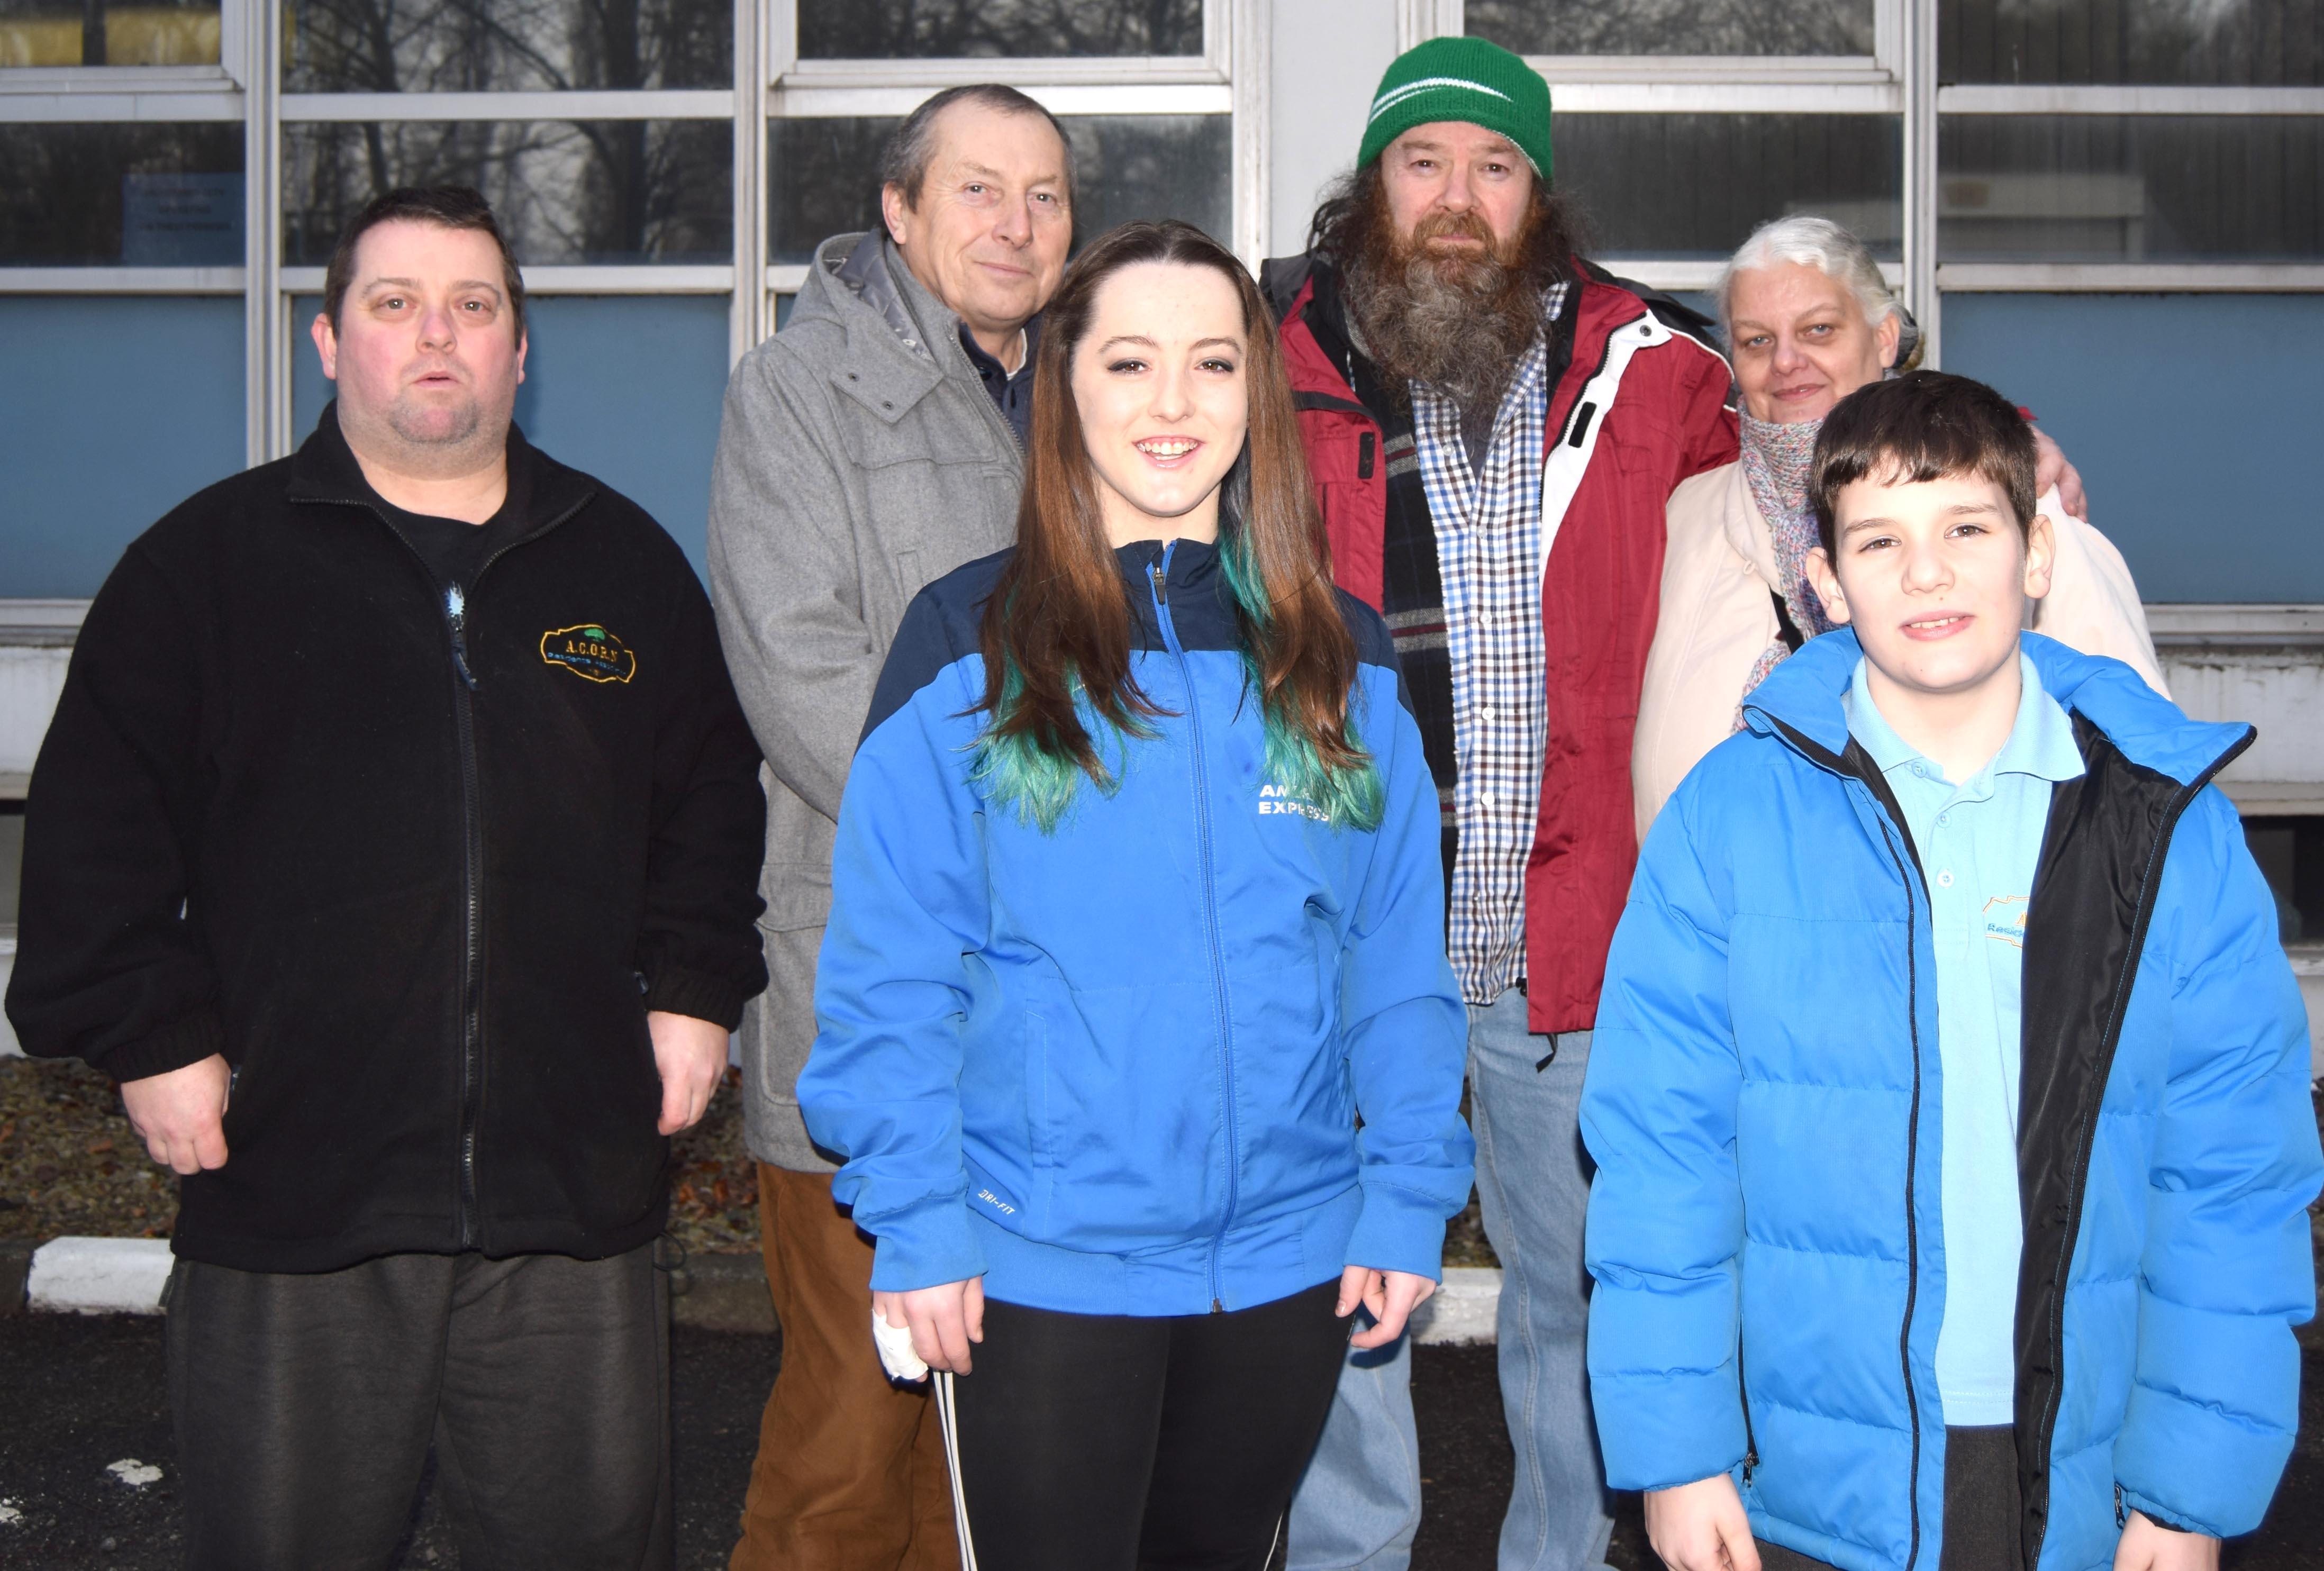 Honest John Helps Residents Association